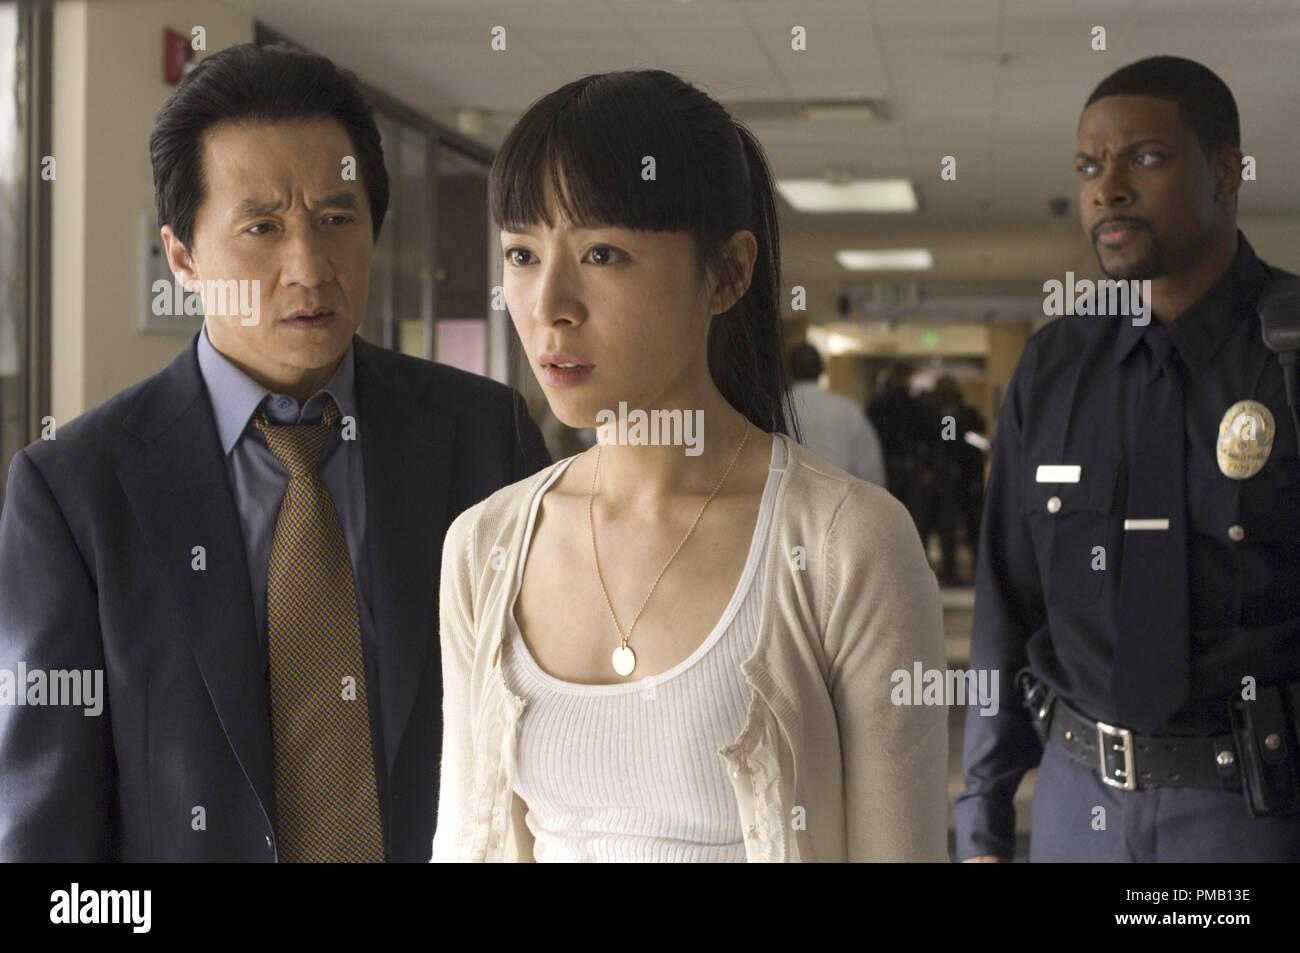 Jackie Chan (left) stars as 'Lee', Jingchu Zhang (center) as